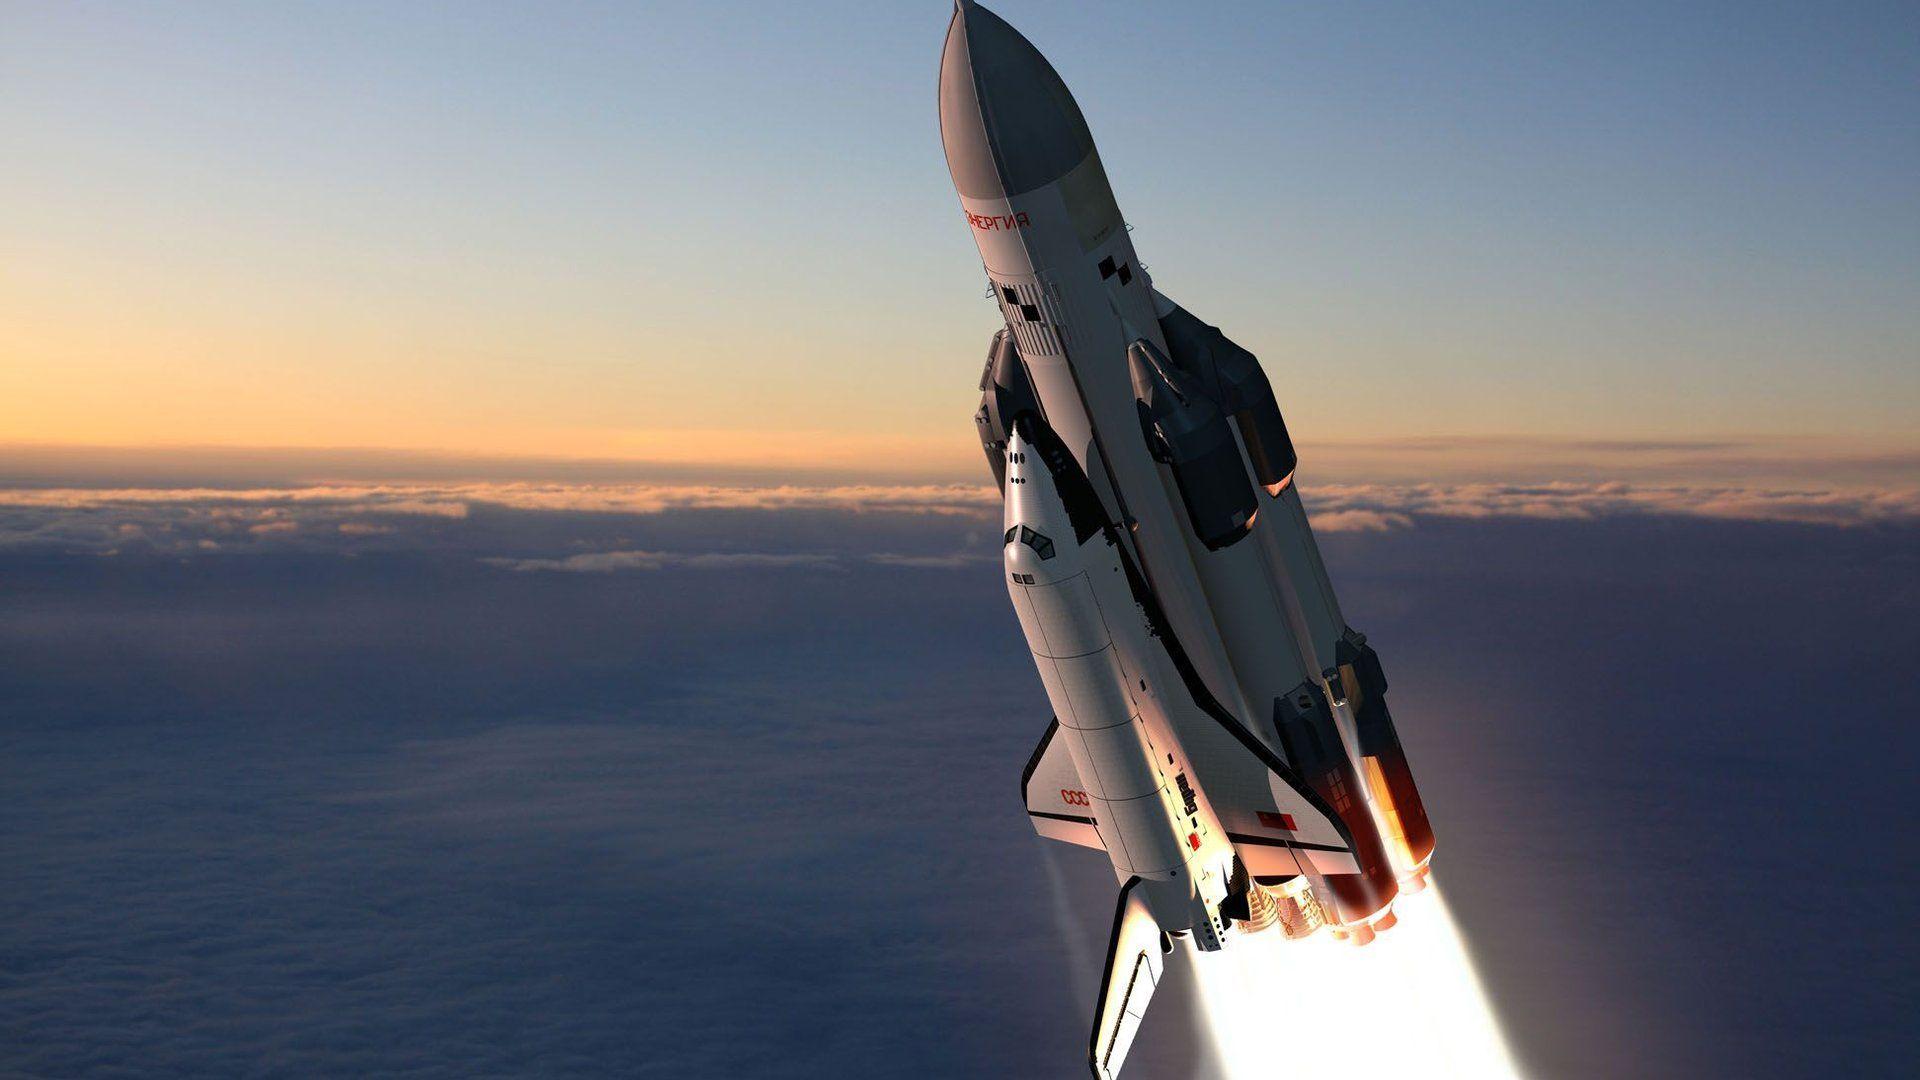 Rocket Pic